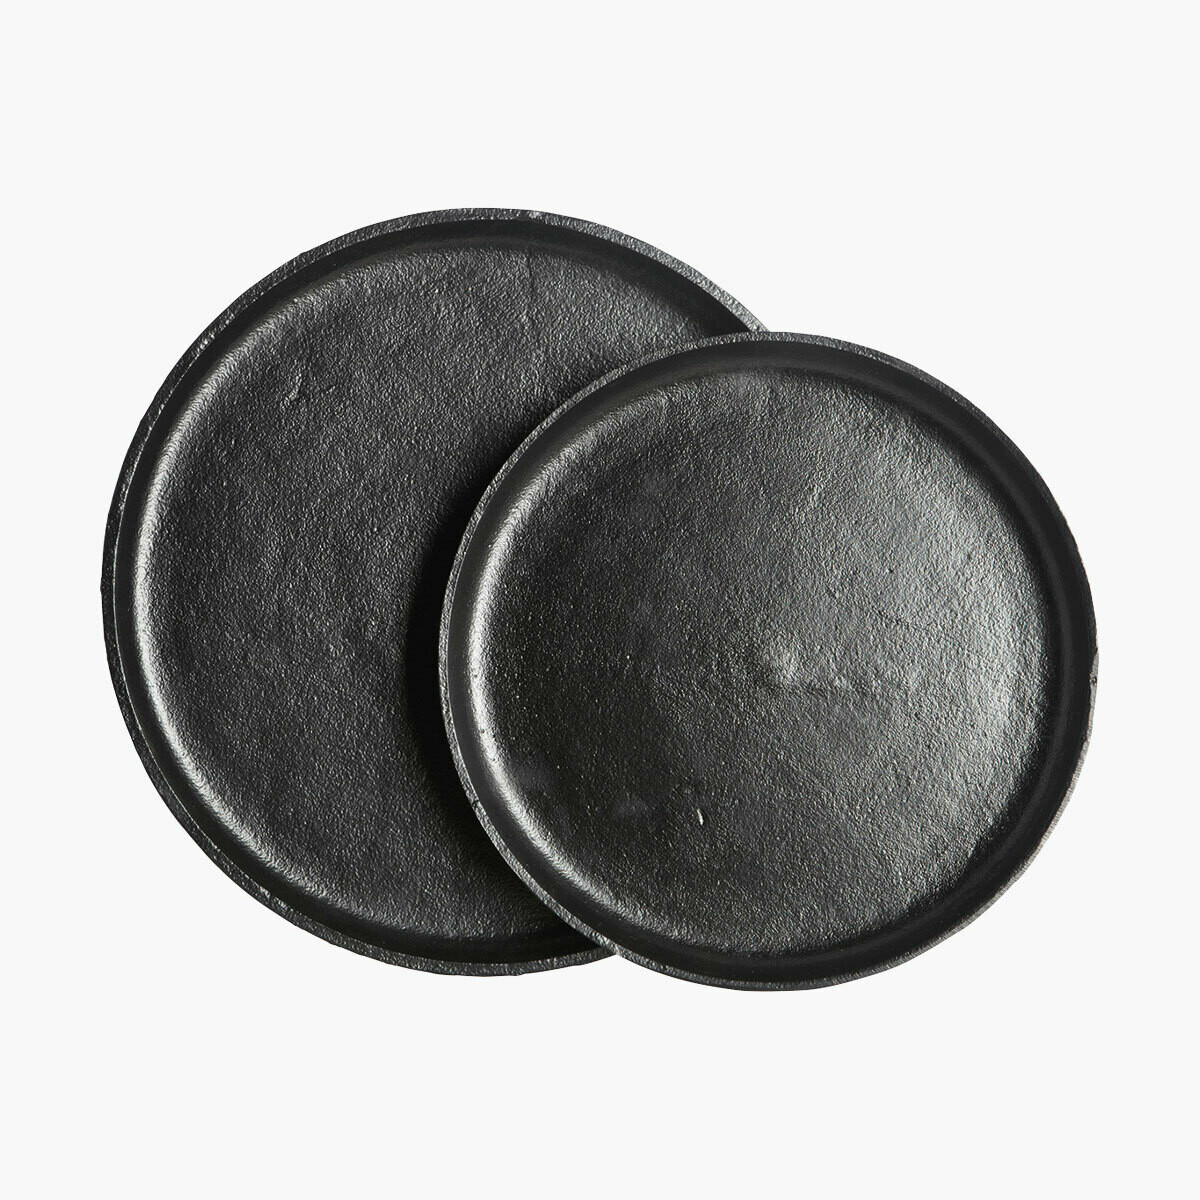 2pcs. Trays Ria, Aluminium, Black